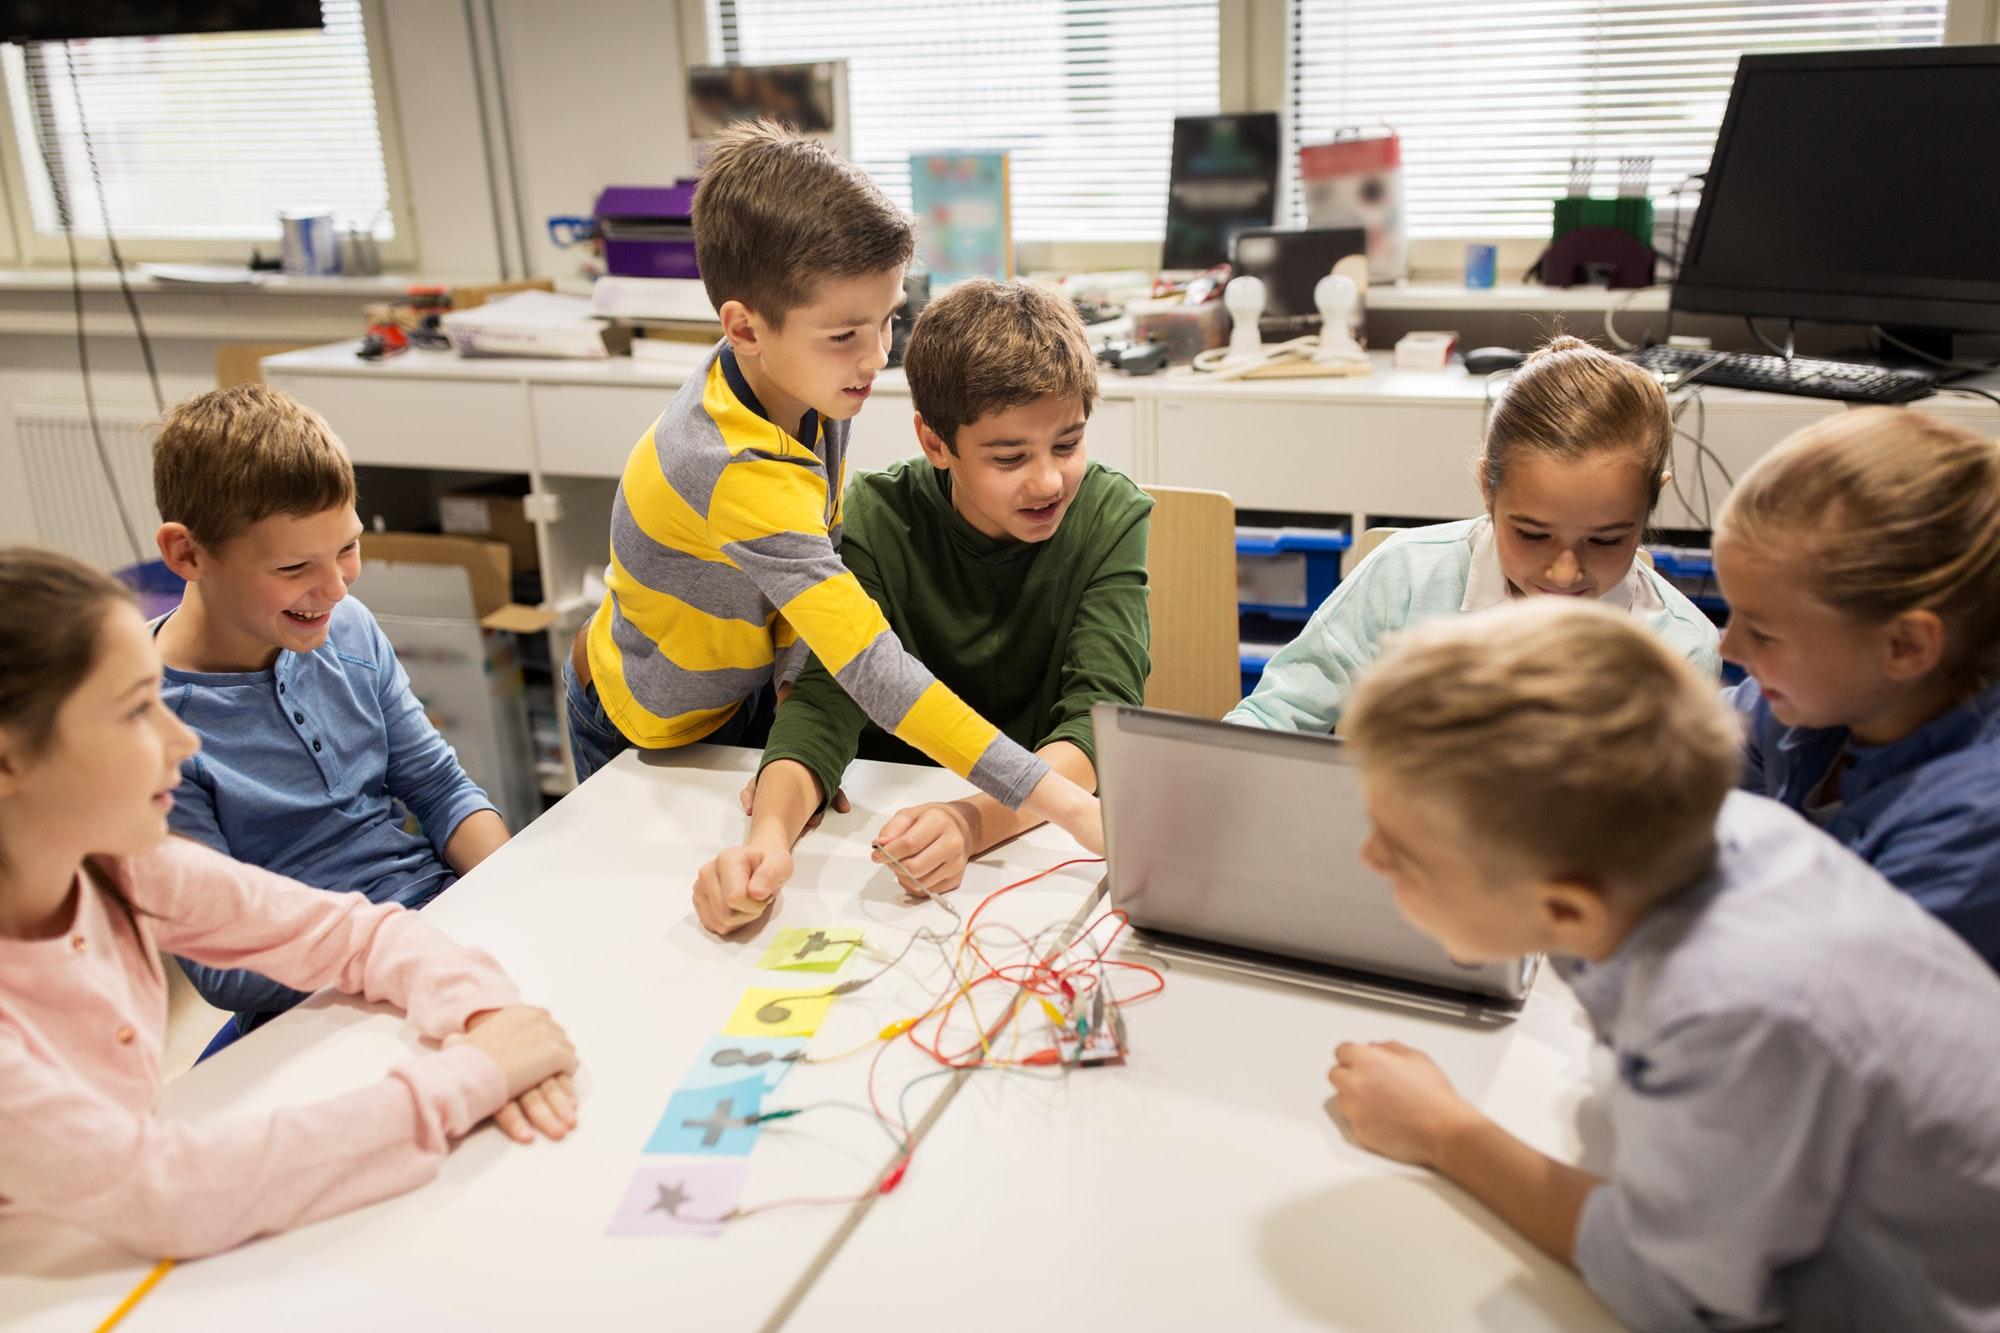 kids, laptop and invention kit at robotics school